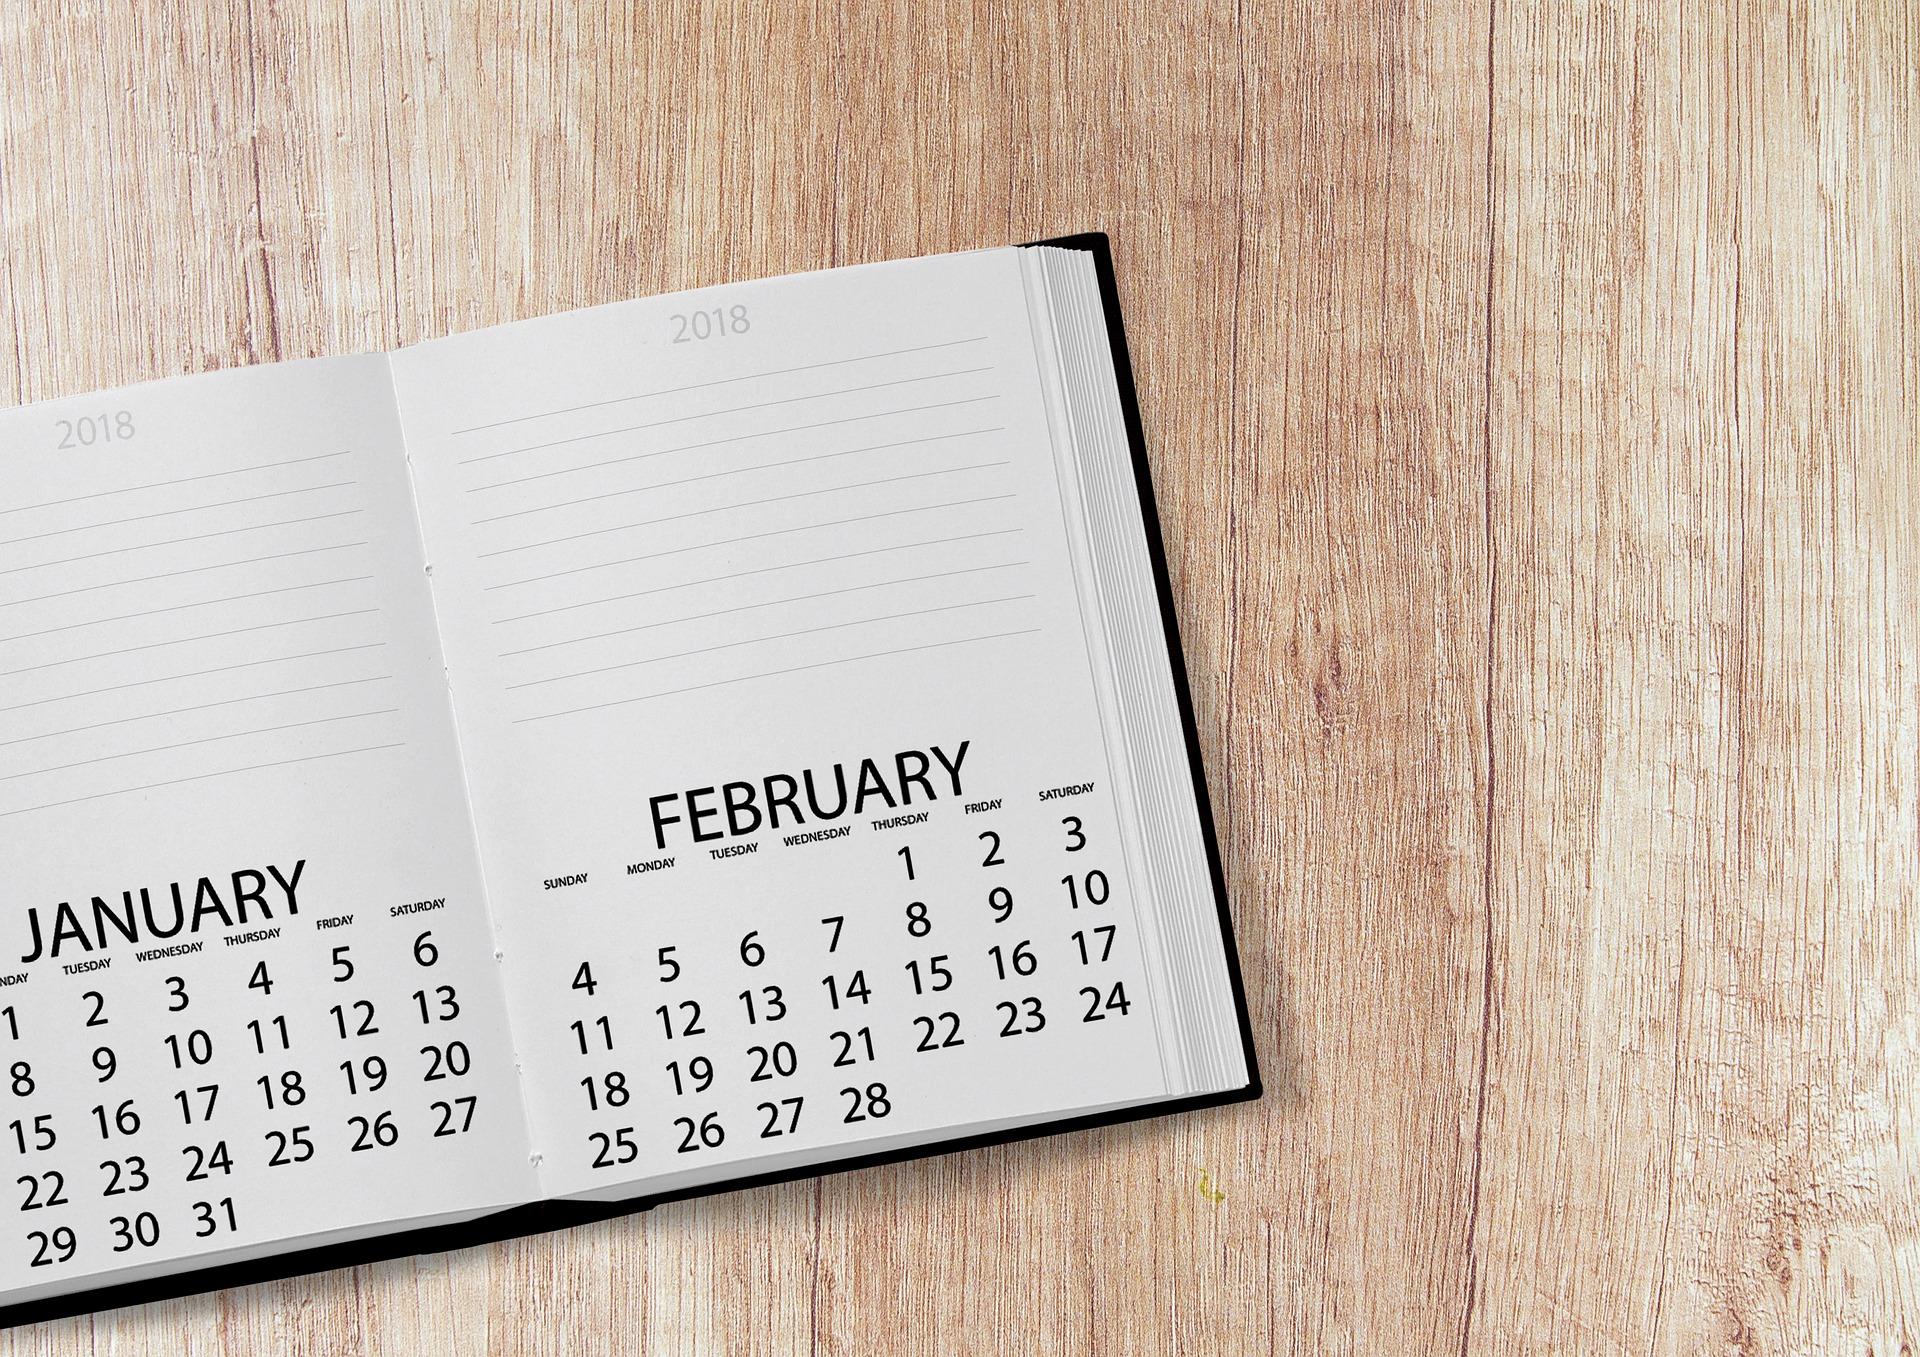 zile libere 2018 - sfatulparintilor.ro - pixabay_com - calendar-3045825_1920